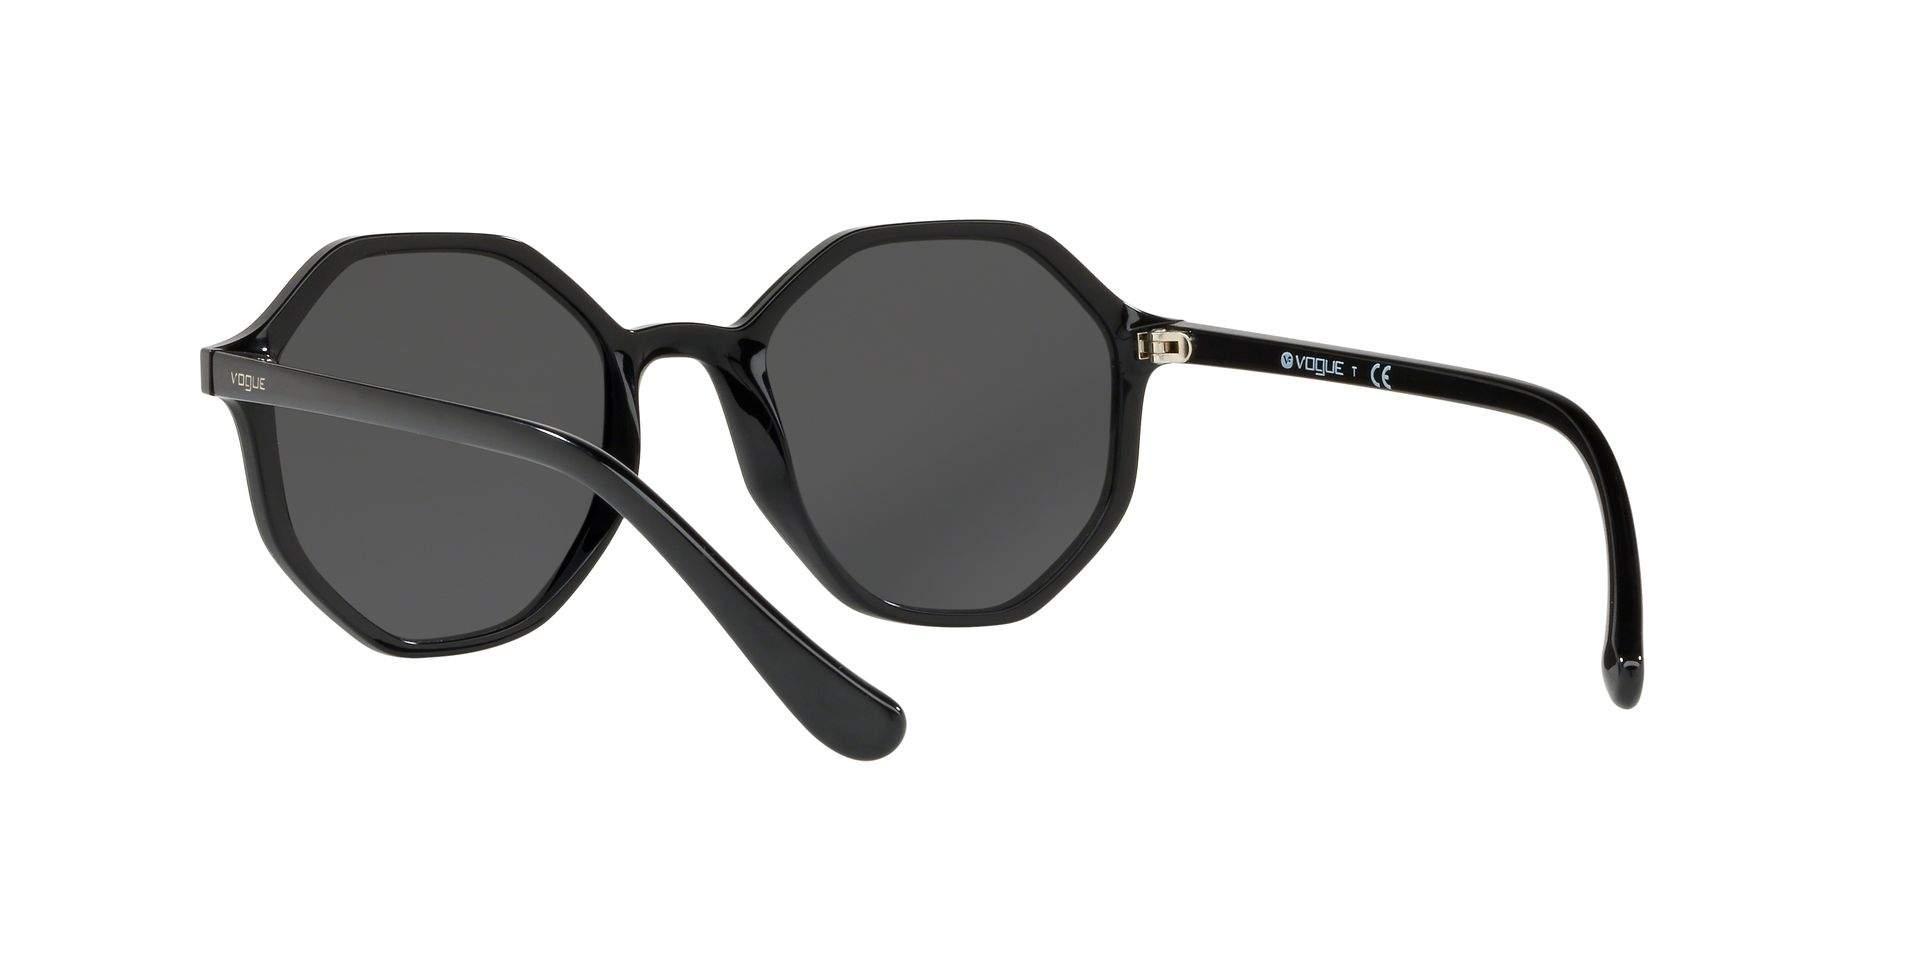 bc440b7827 Sunglasses Vogue Light and shine Black VO5222S W44 87 52-20 Medium